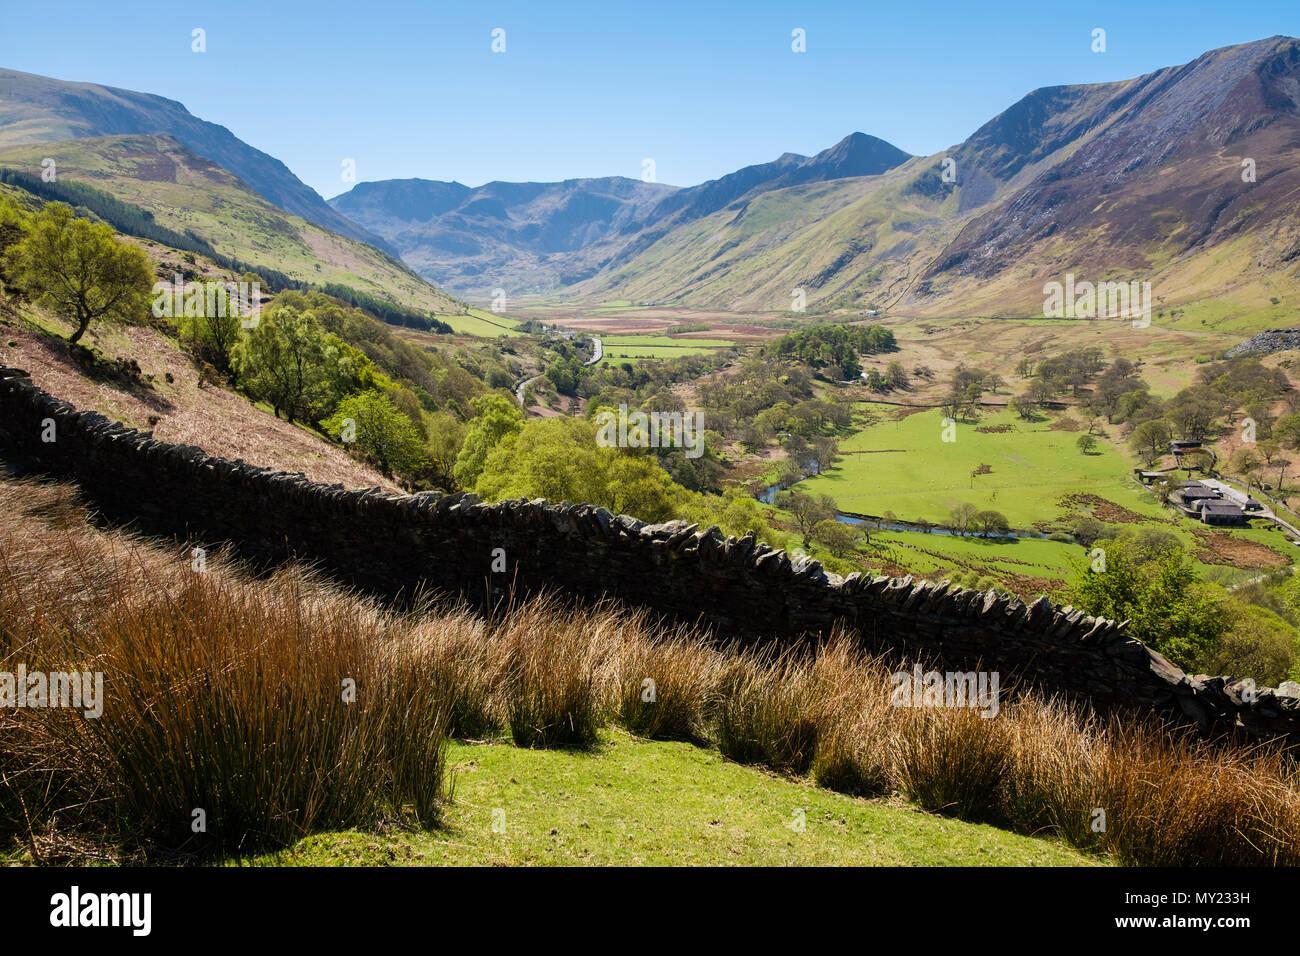 Visualiser jusqu'Nant Ffrancon valley vers Glyderau montagnes de Snowdonia National Park (Eryri) en été. Bethesda, Gwynedd, au nord du Pays de Galles, Royaume-Uni, Angleterre Photo Stock